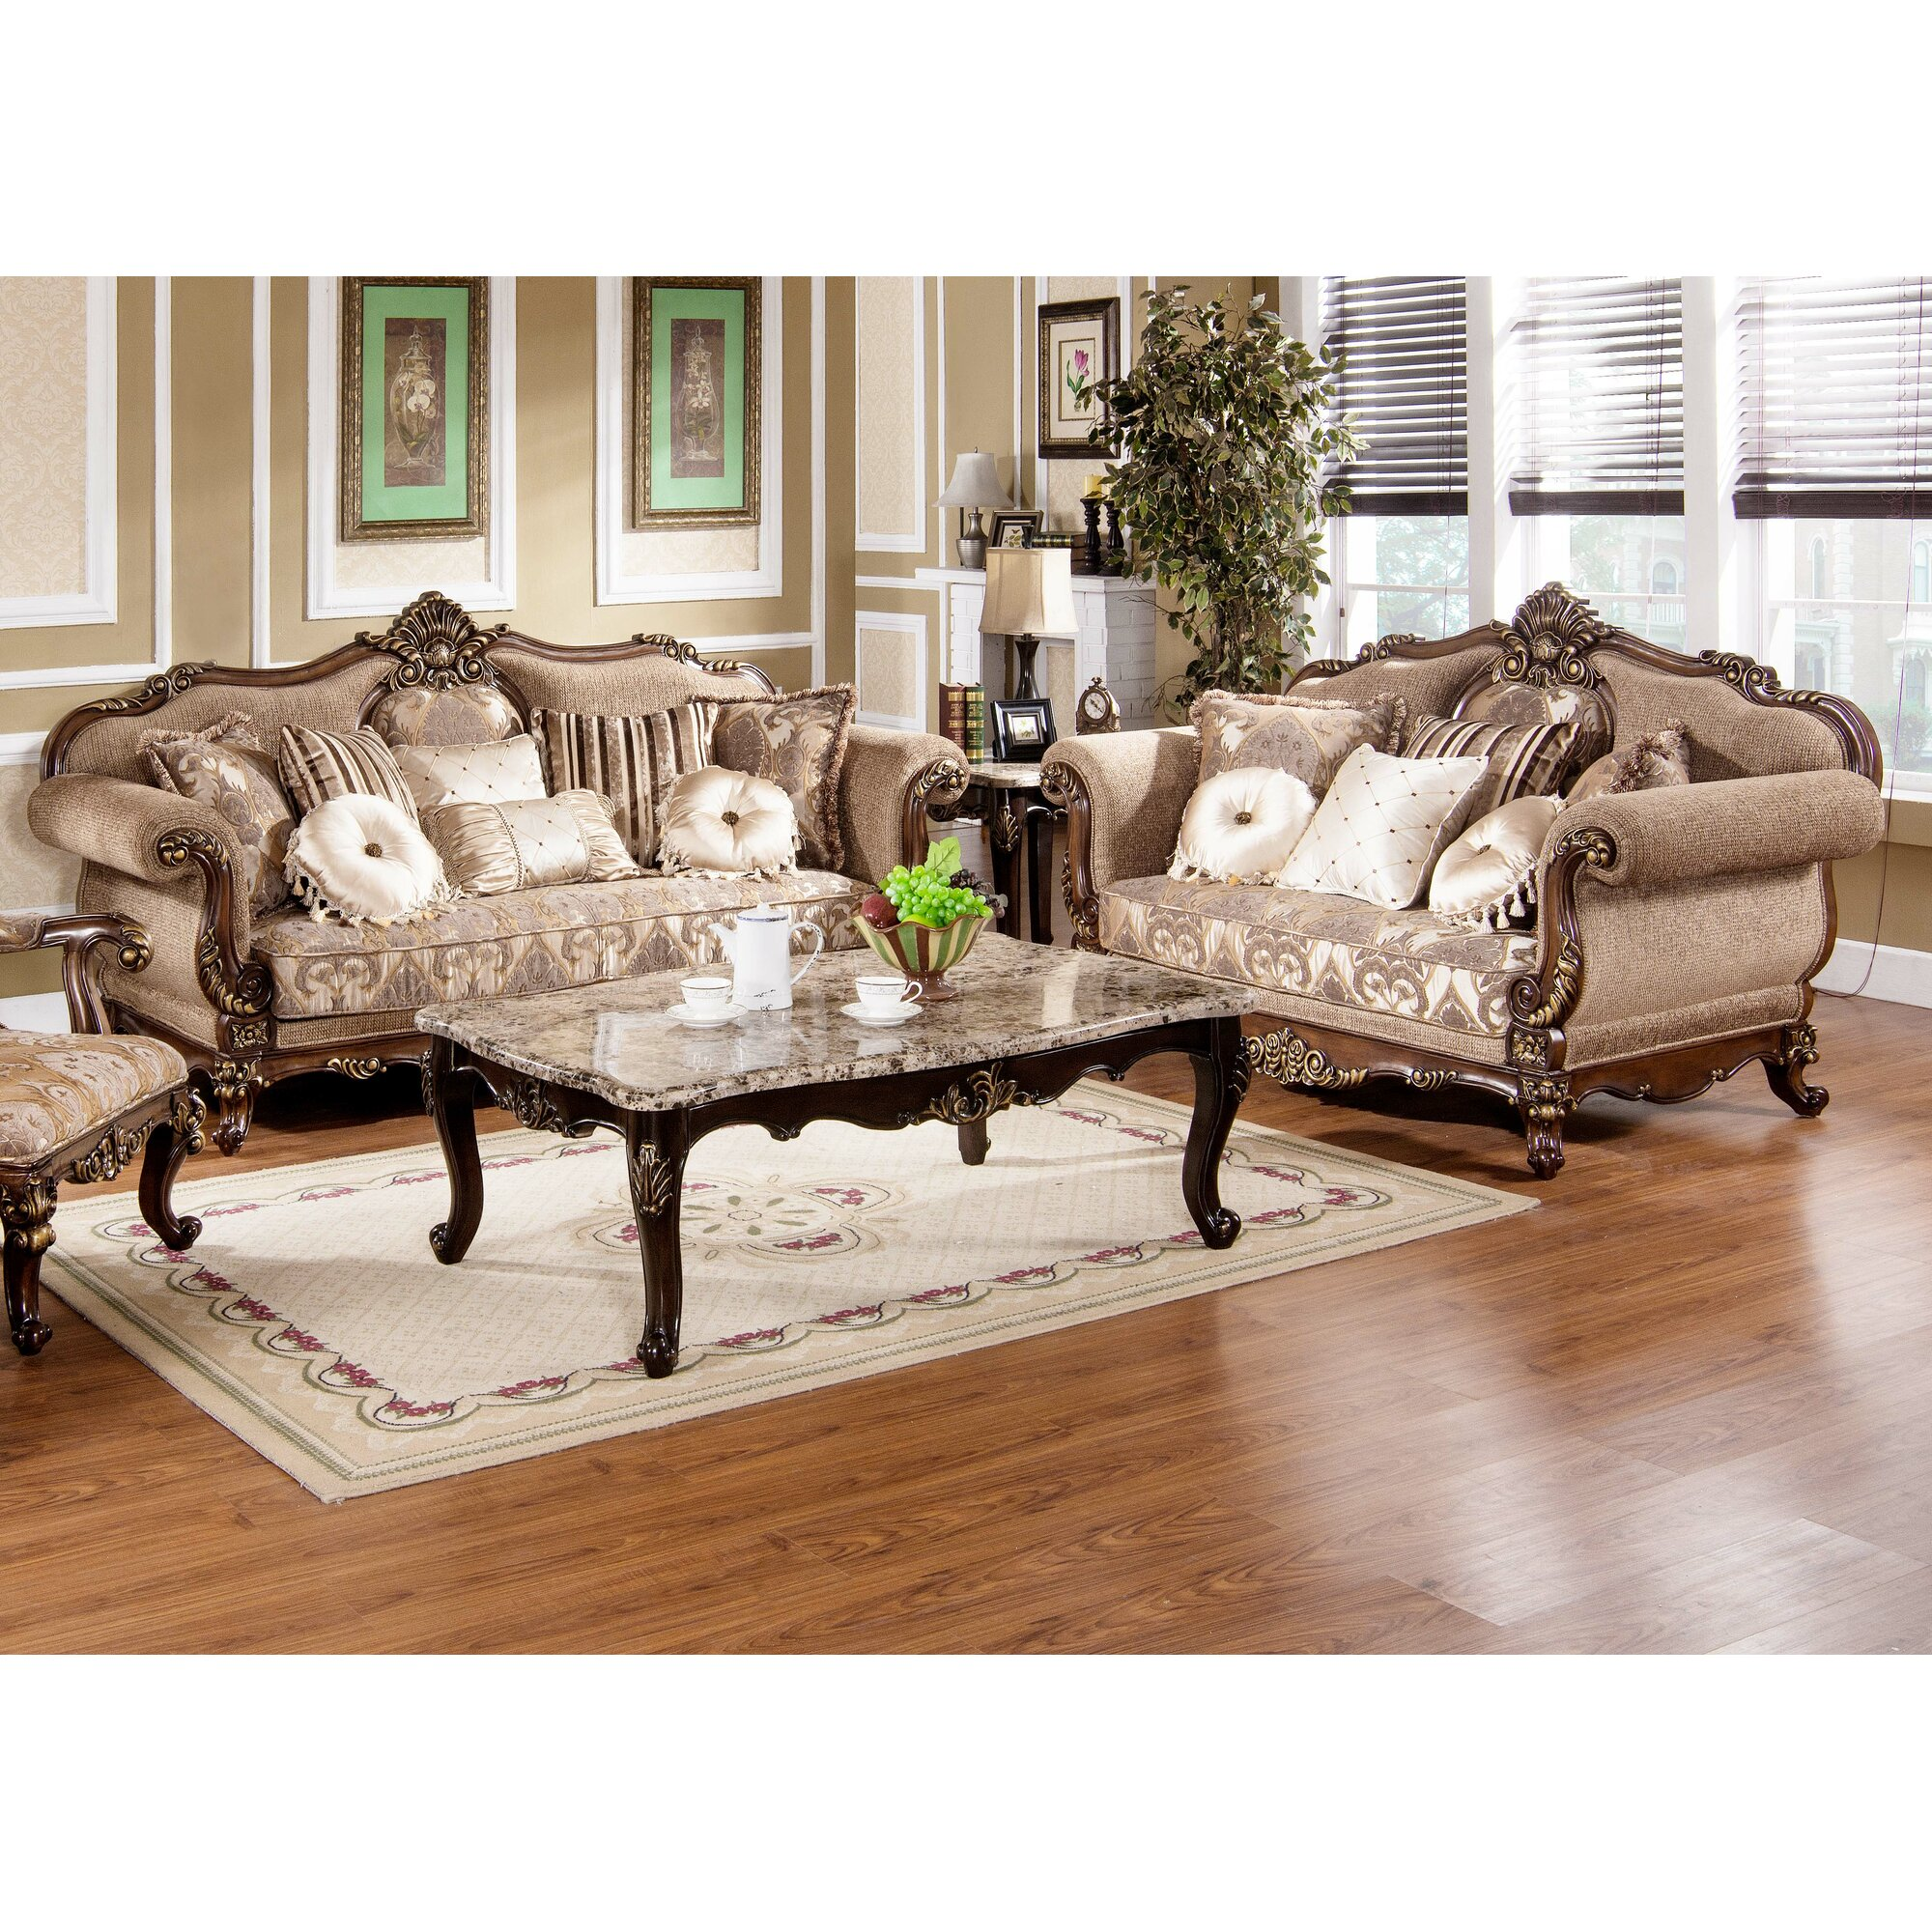 Home Decor Peabody Astoria Grand Peabody Traditional Sofa And Loveseat Set